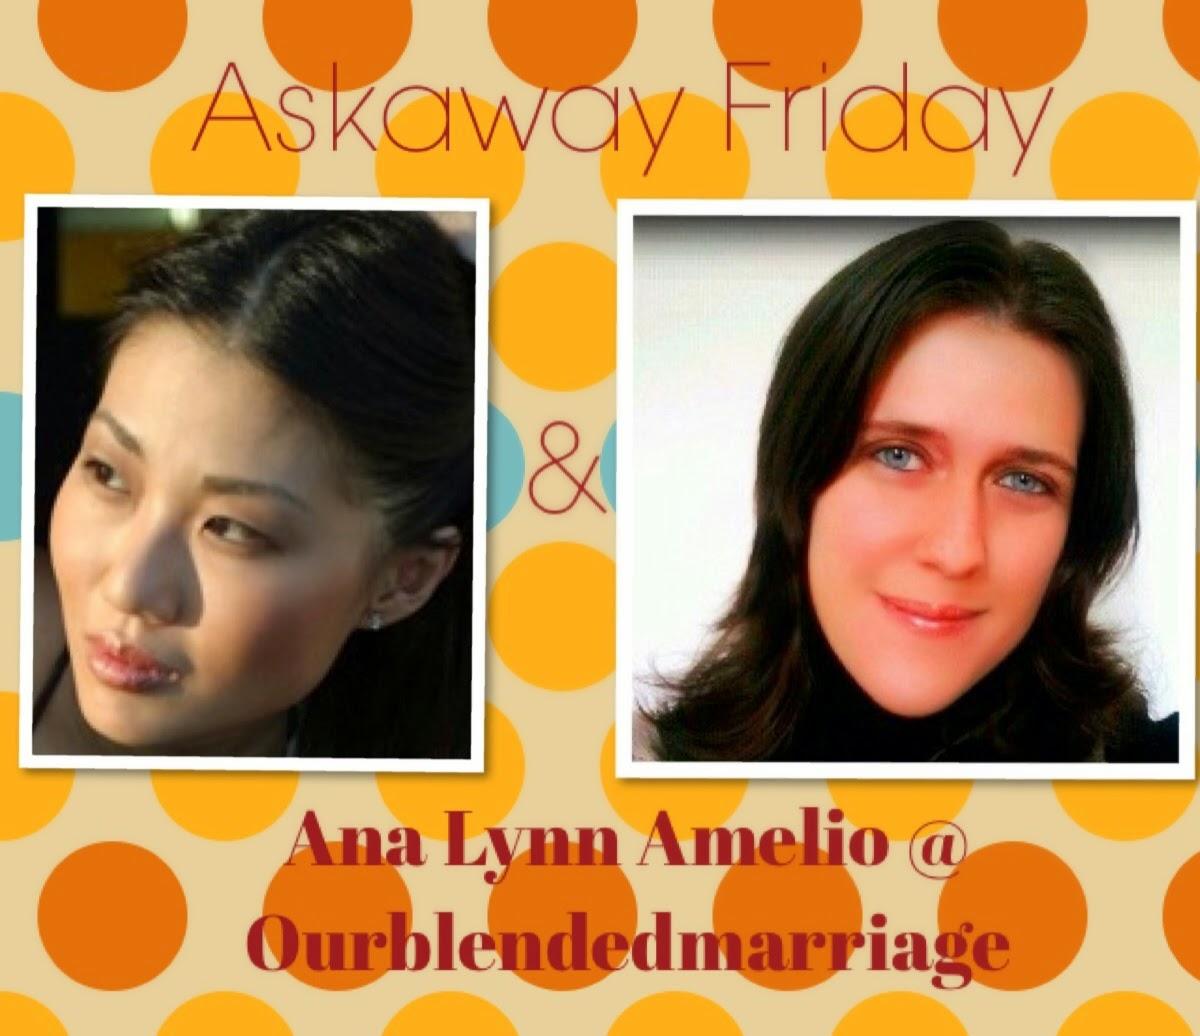 Askaway Fridays